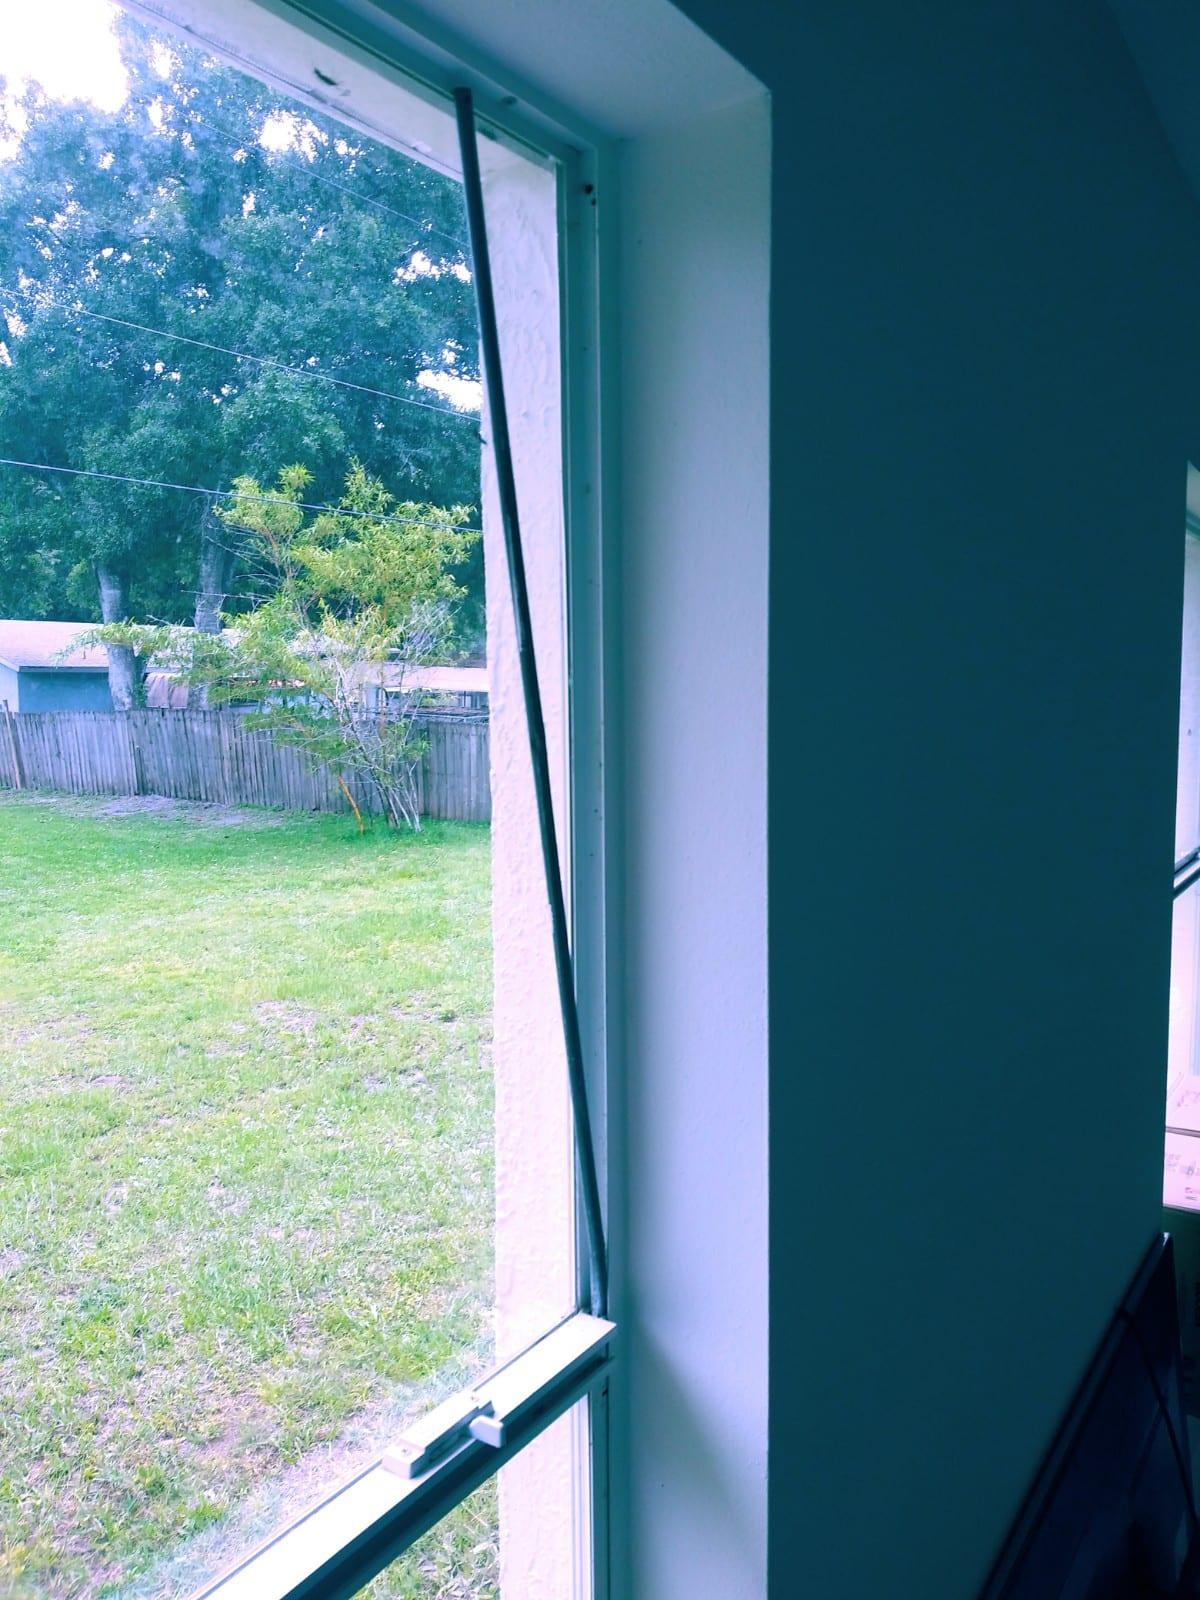 Broken Home Window Repair Melbourne FL